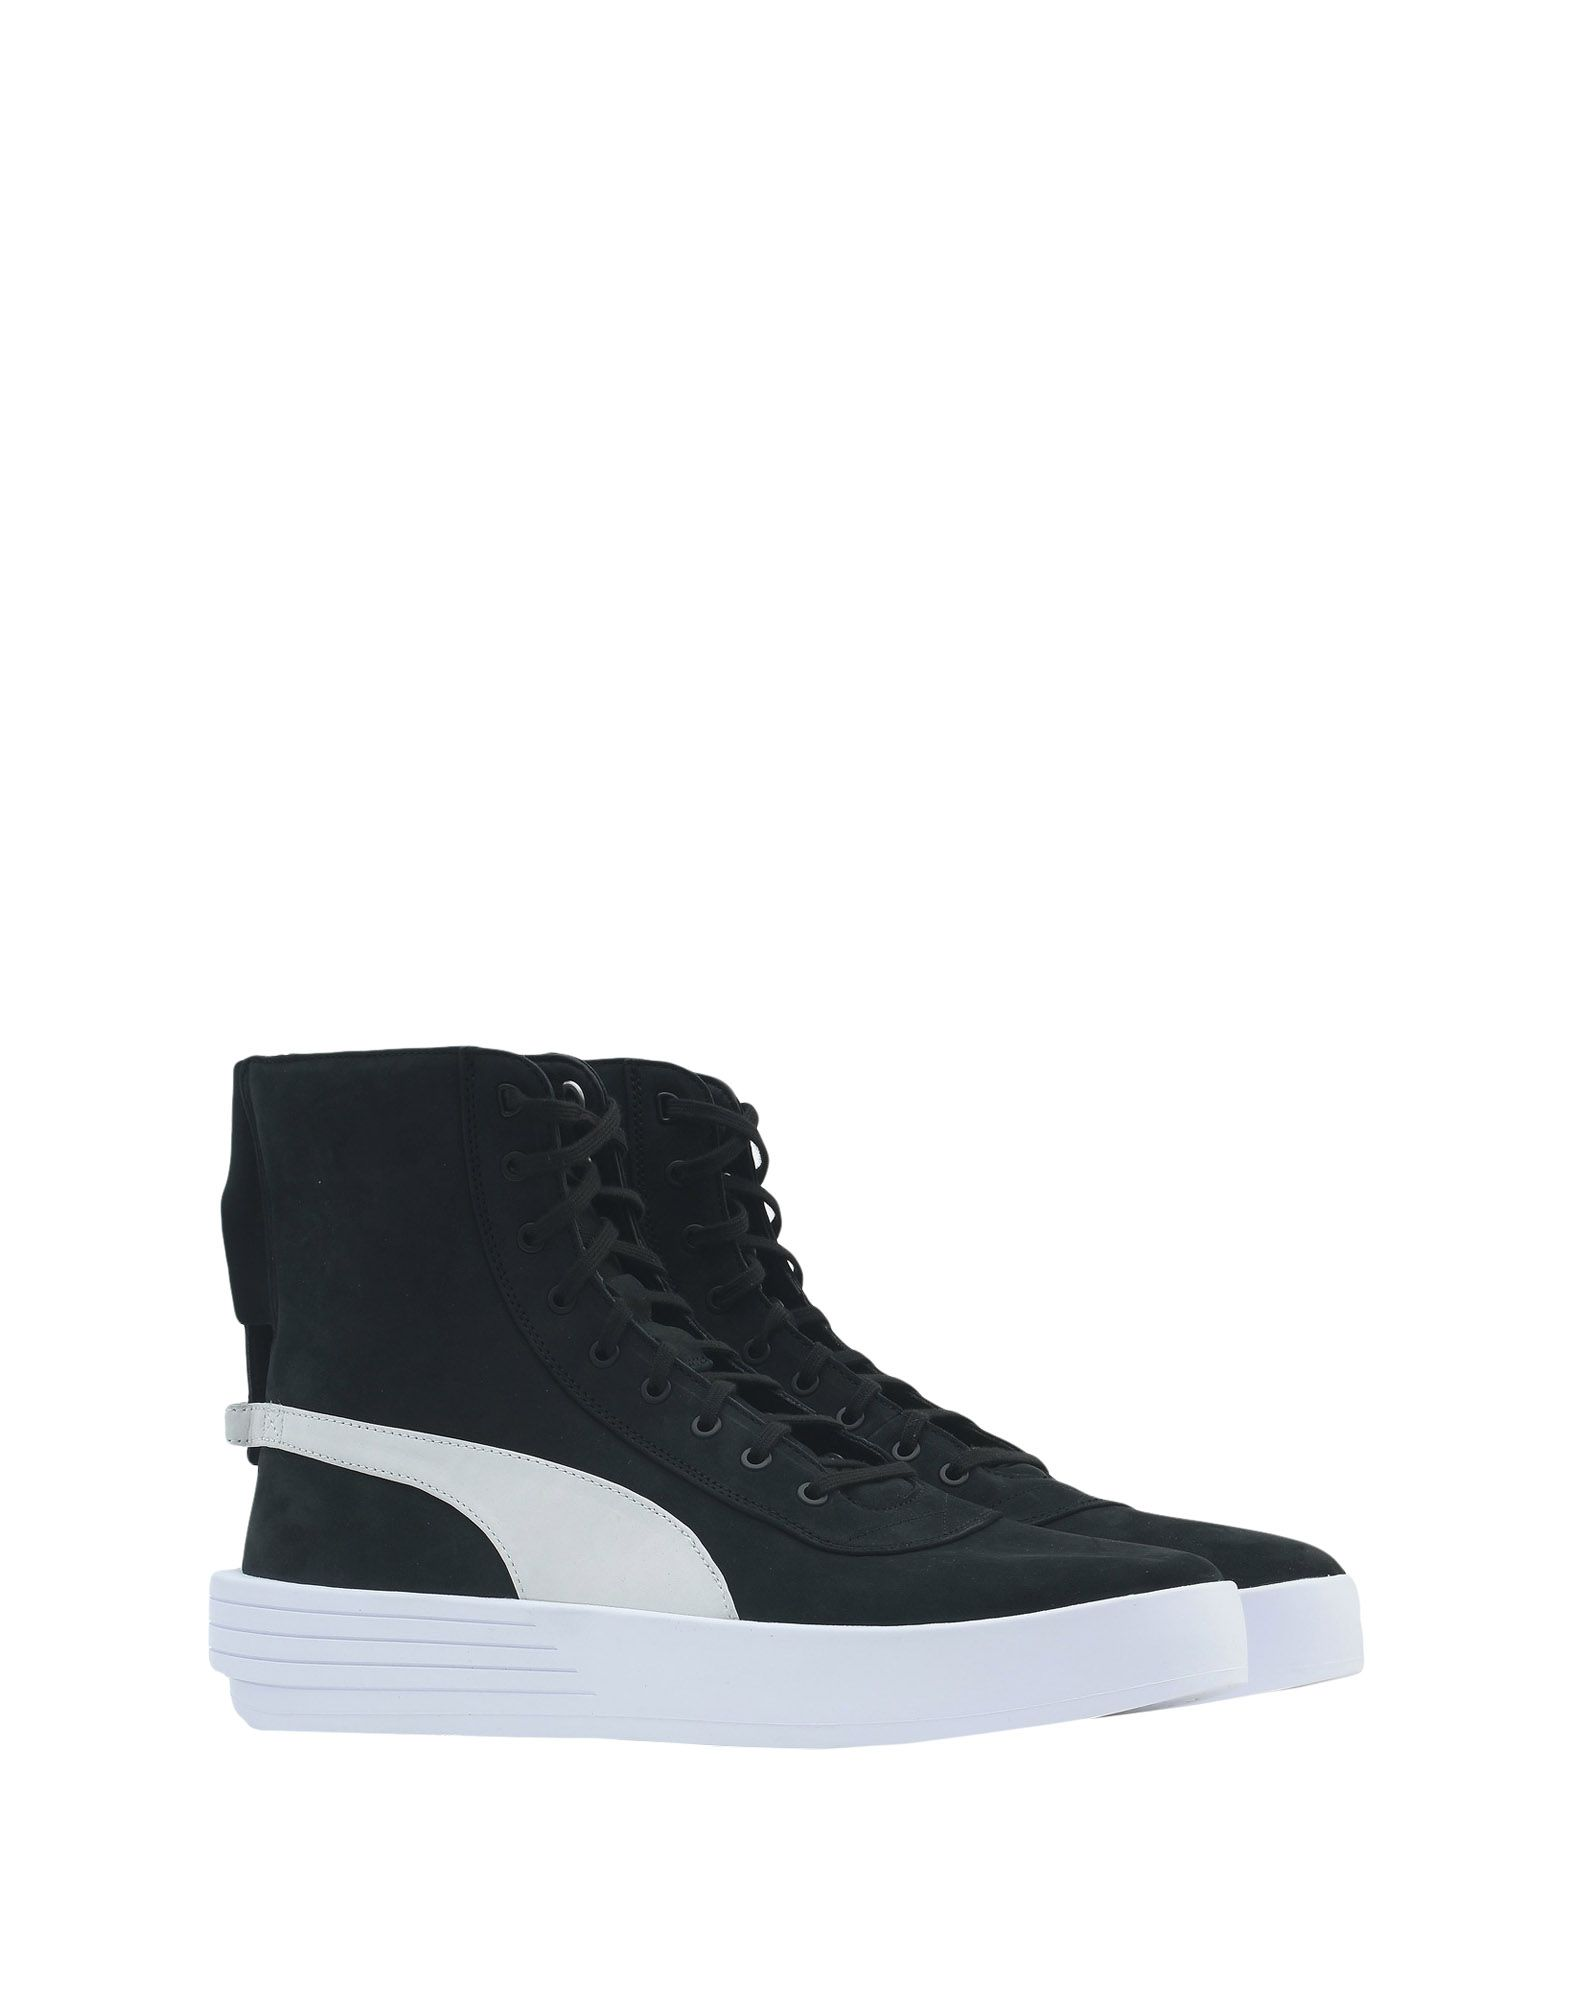 Puma 11502892WA X Xo Puma Xo Parallel  11502892WA Puma Gute Qualität beliebte Schuhe c9b85a